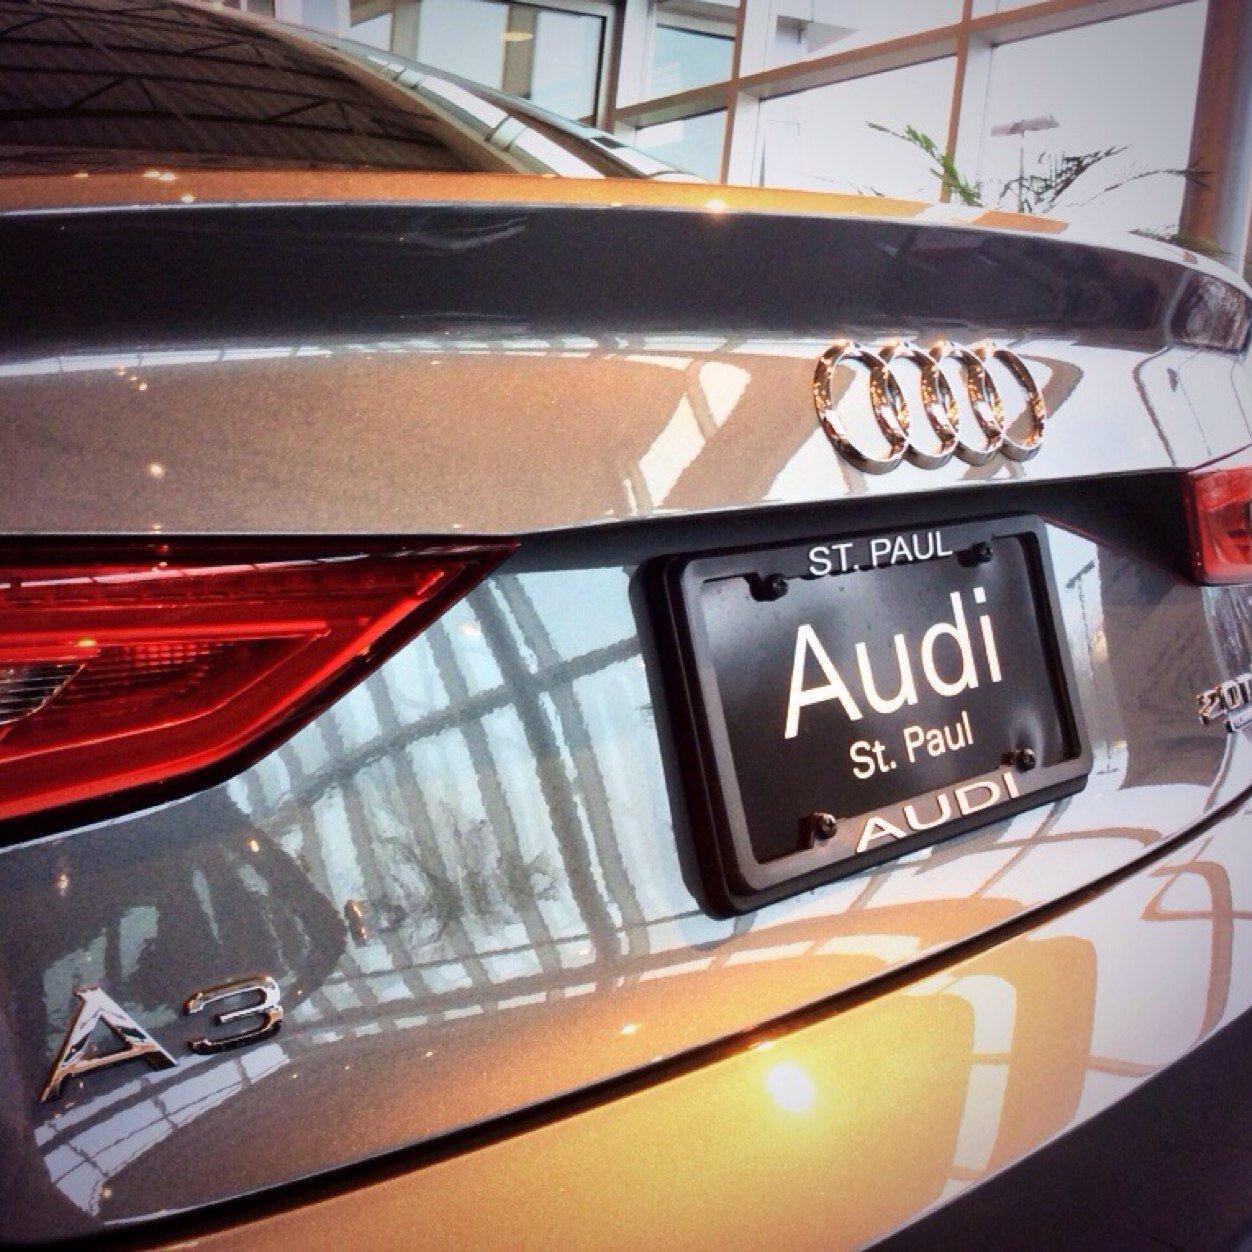 Audi StPaul AudiStPaul Twitter - Audi st paul